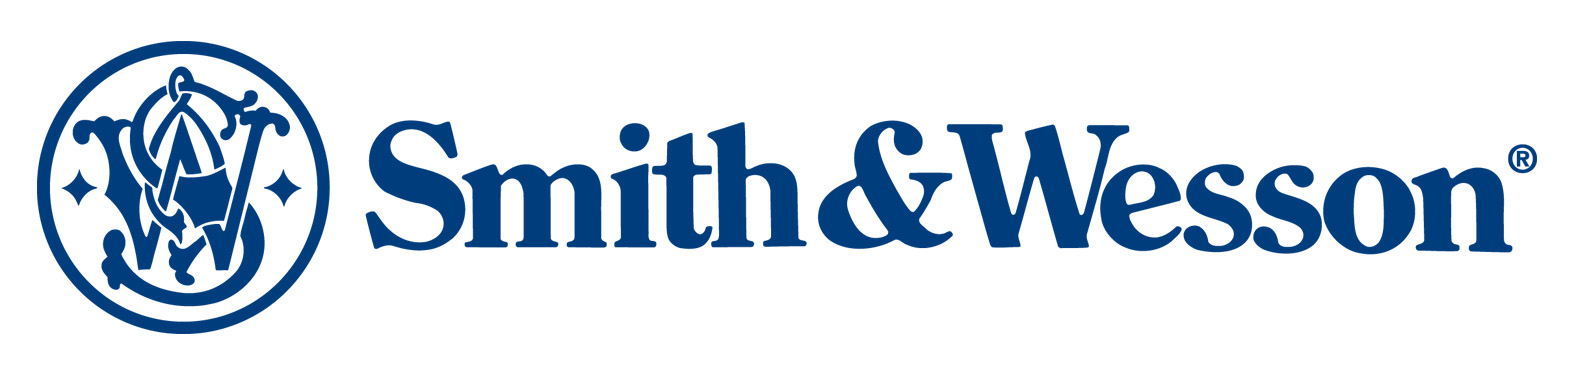 Image result for s&w logo